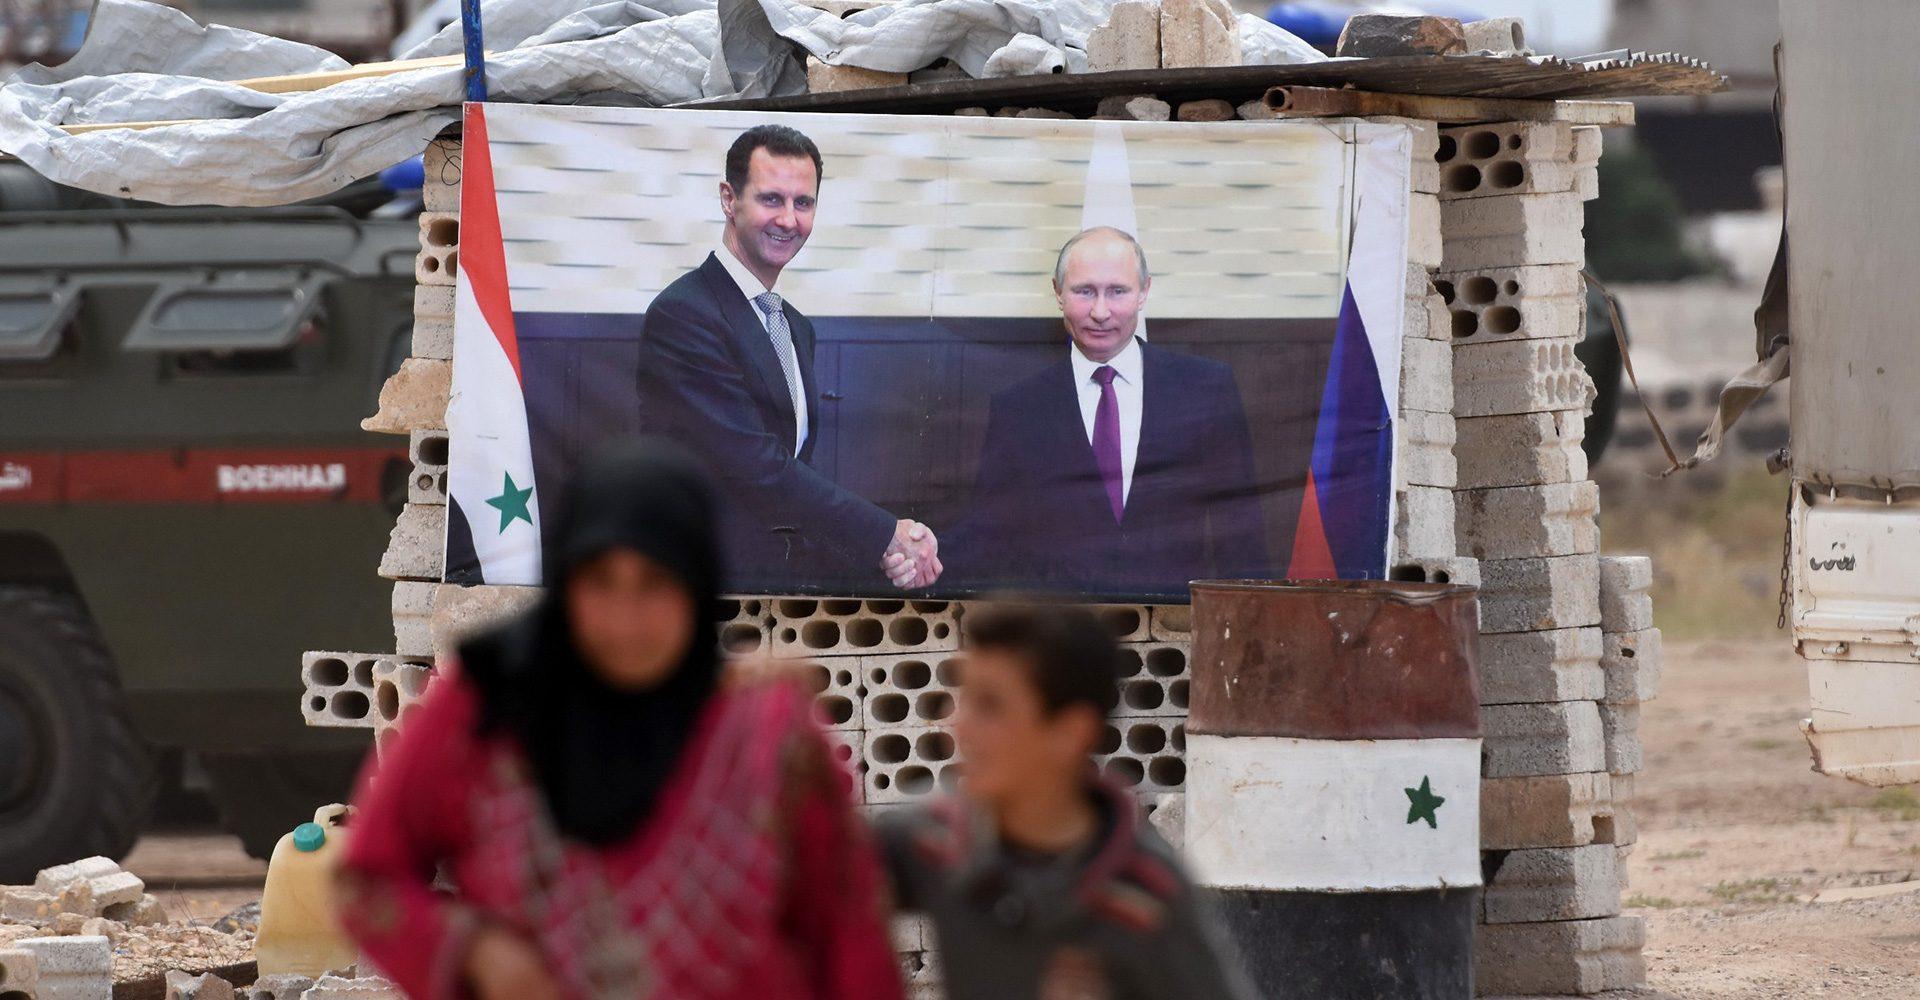 e00f94f1ff047 لماذا يمنع الأسد عودة اللاجئين إلى بلادهم؟